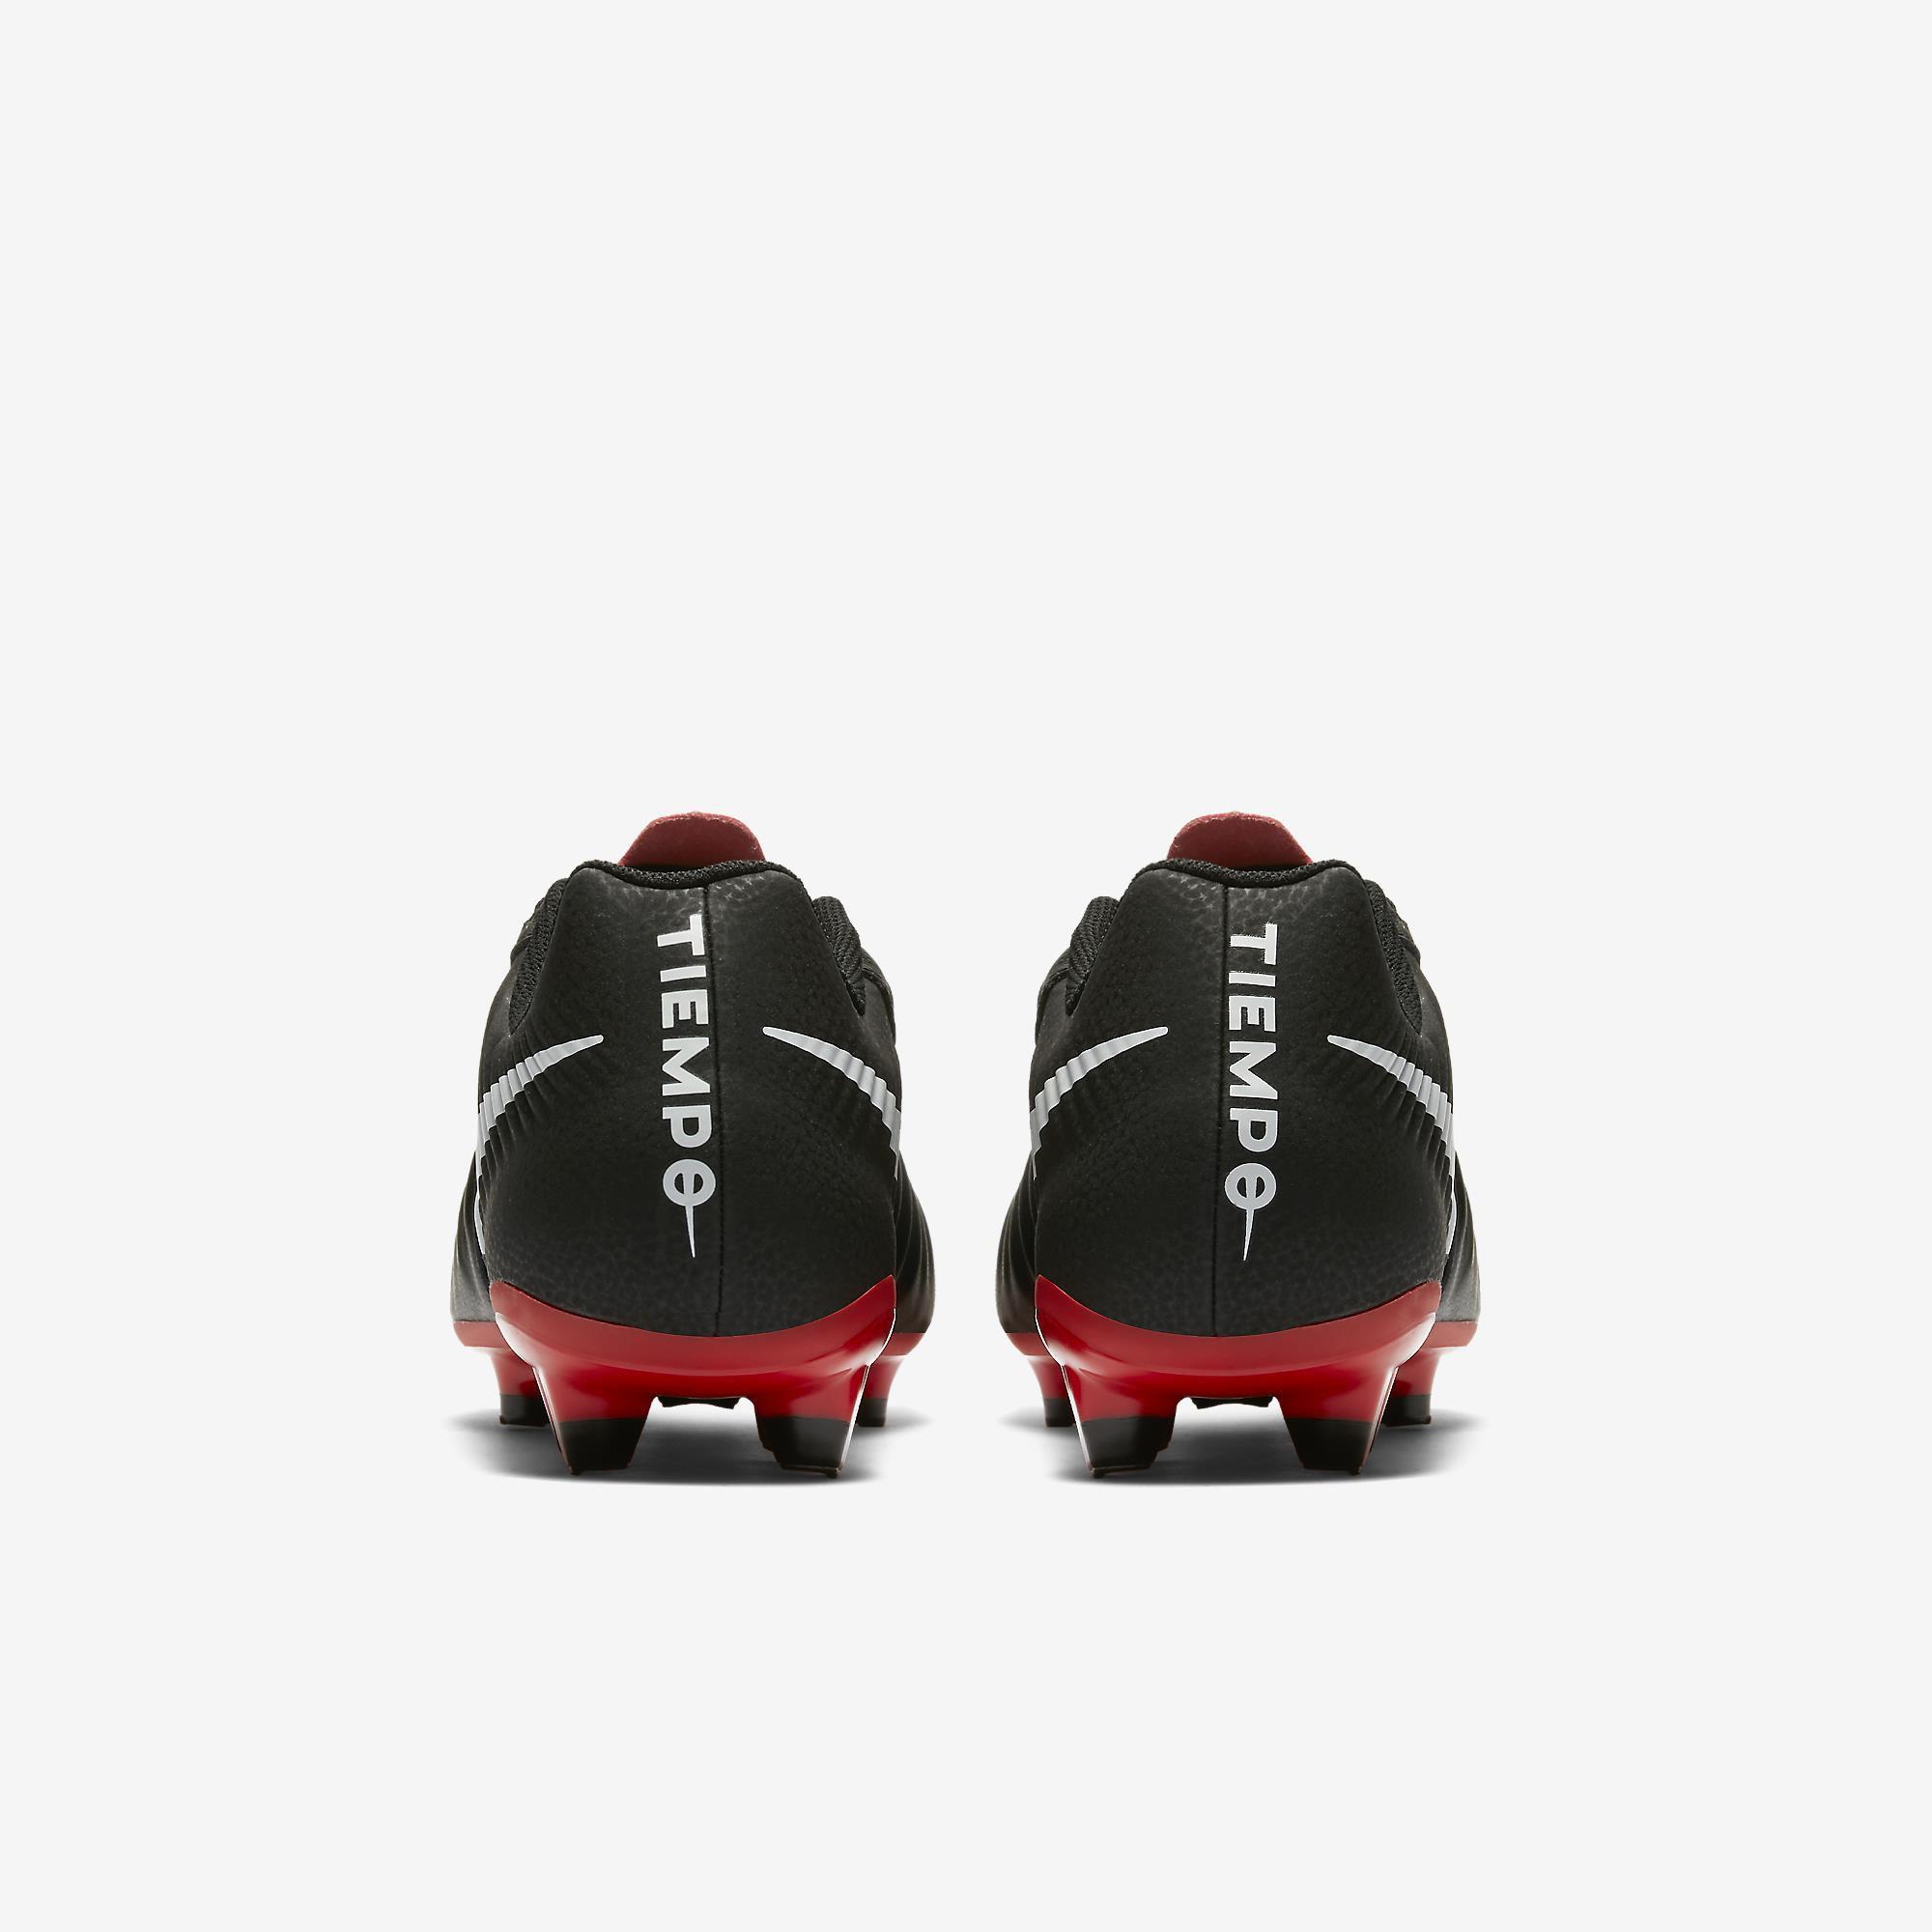 c272f28a4f Chuteira Nike Tiempo Legend VII - BRACIA SHOP  Loja de Roupas ...